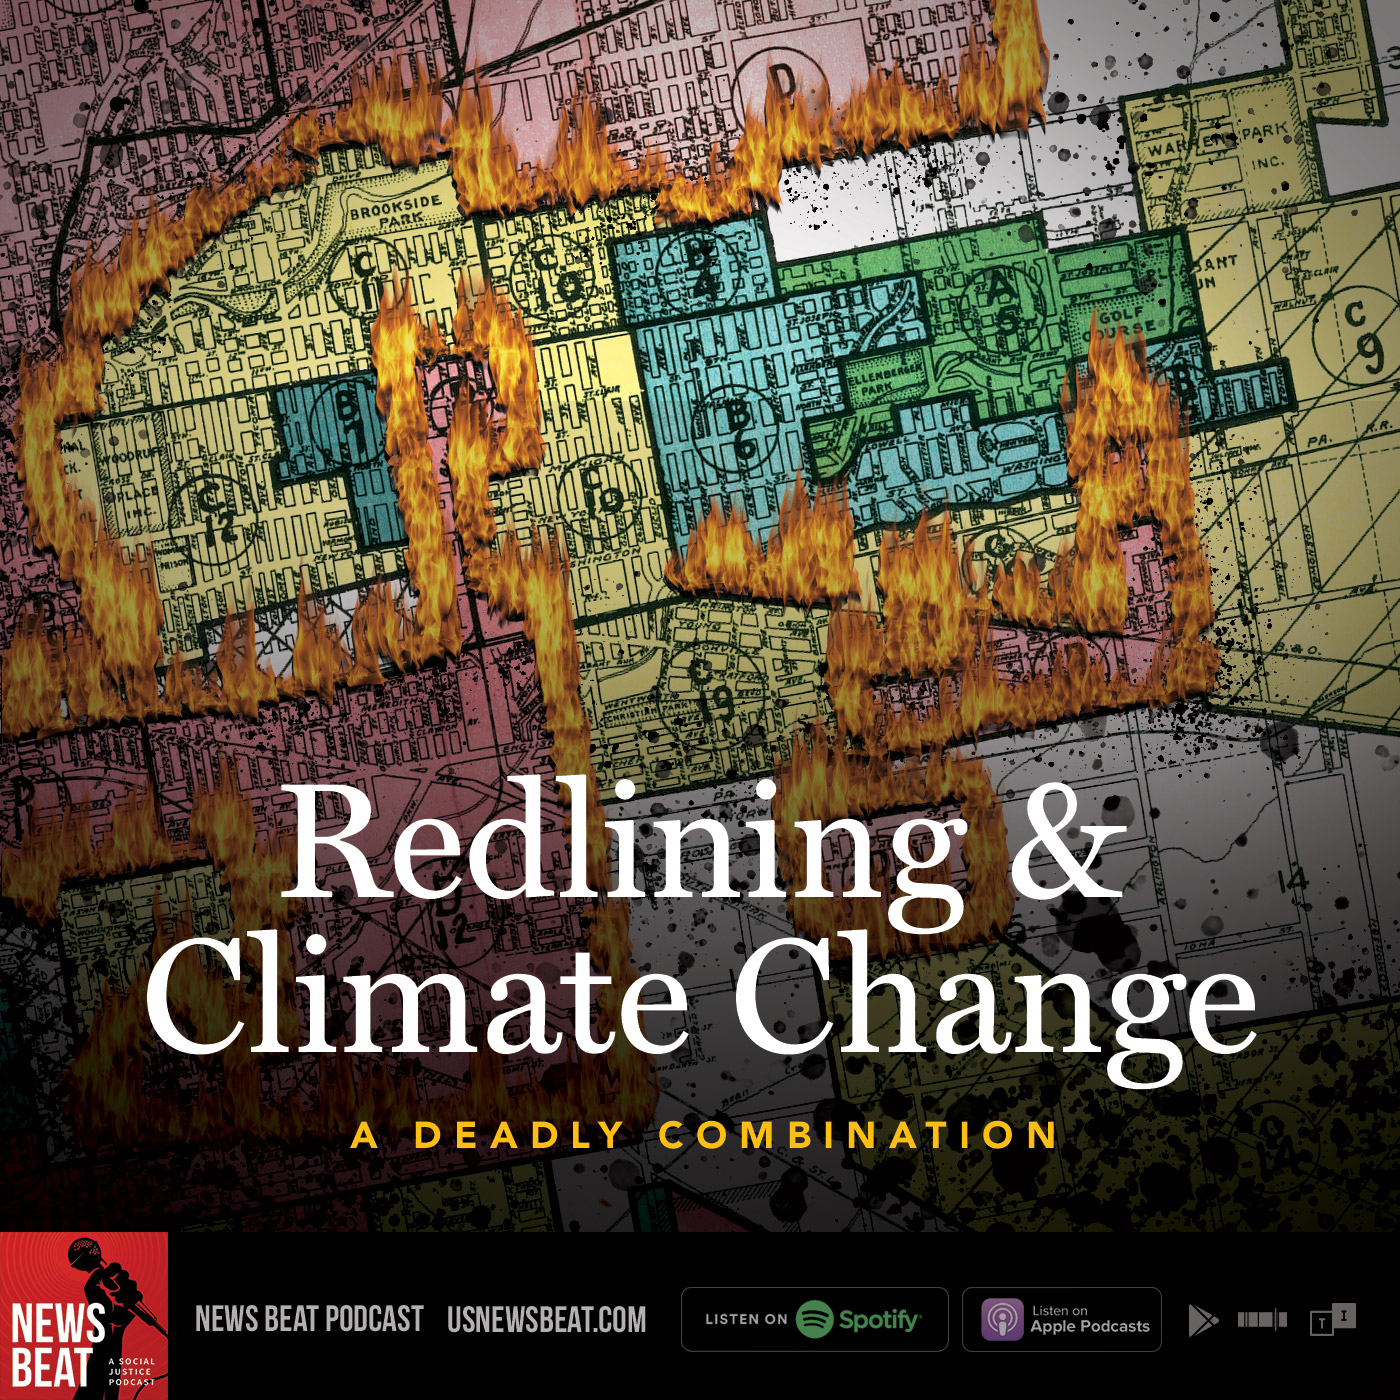 Redlining & Climate Change